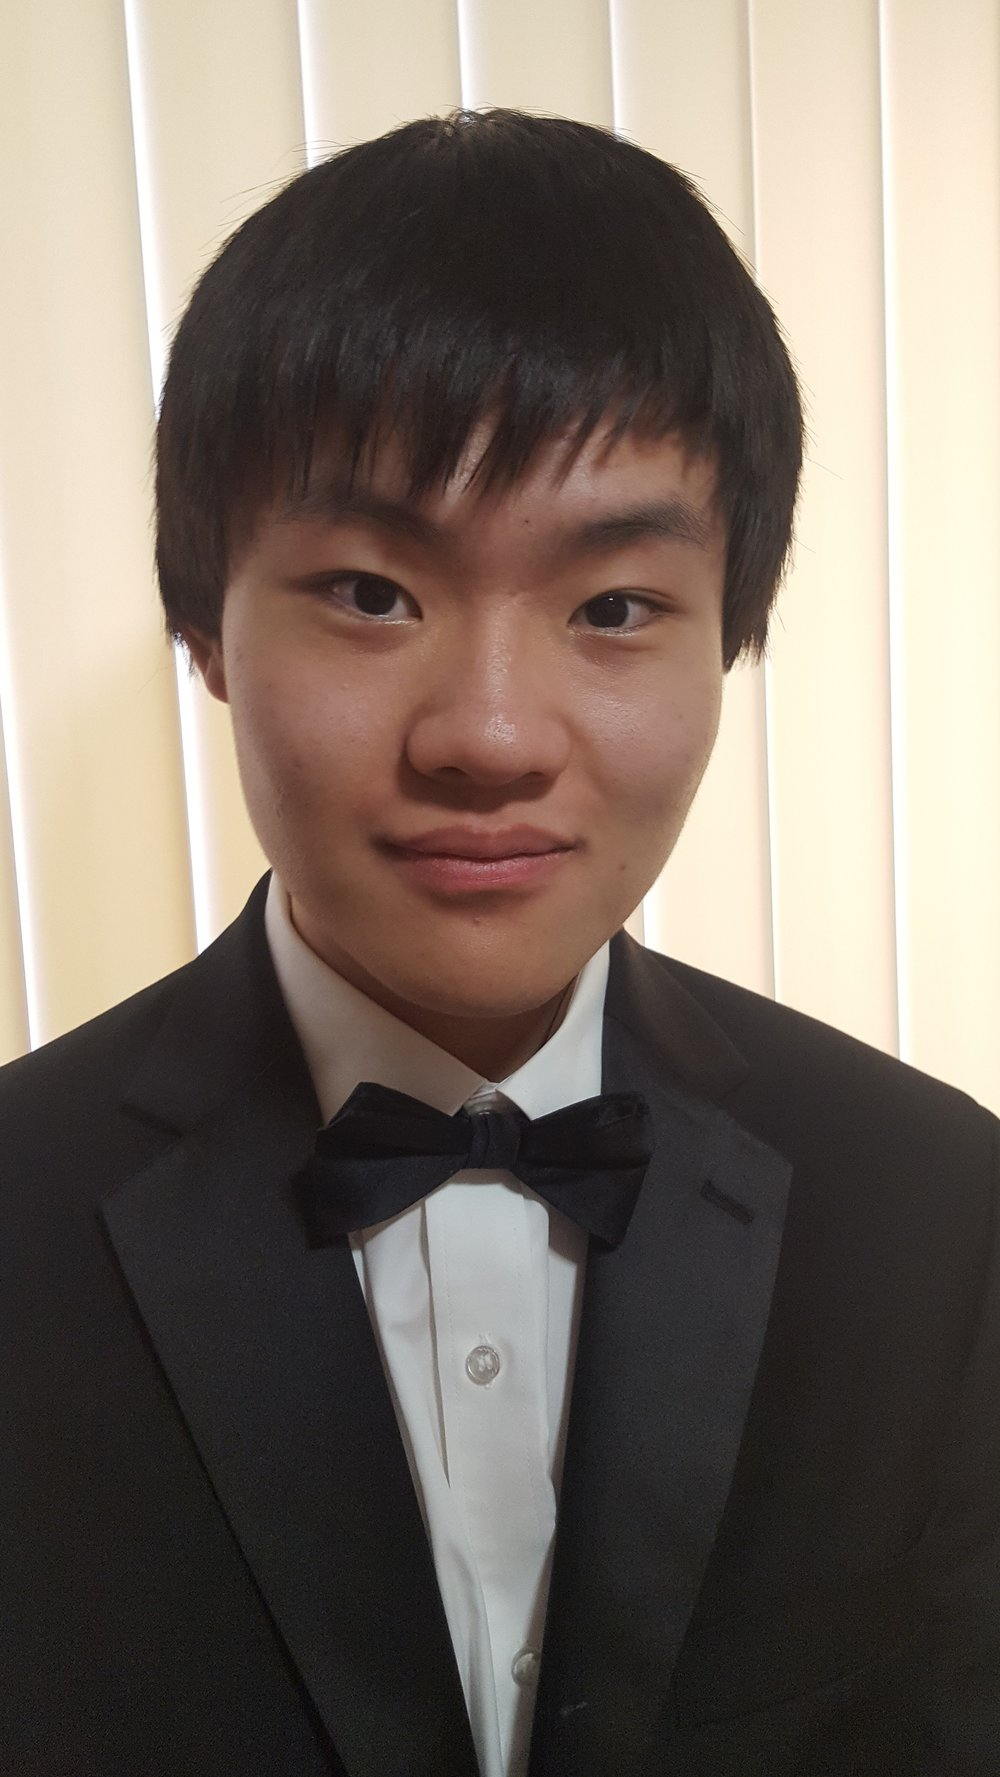 Junhao Wang, UT Student of Jack Winerock